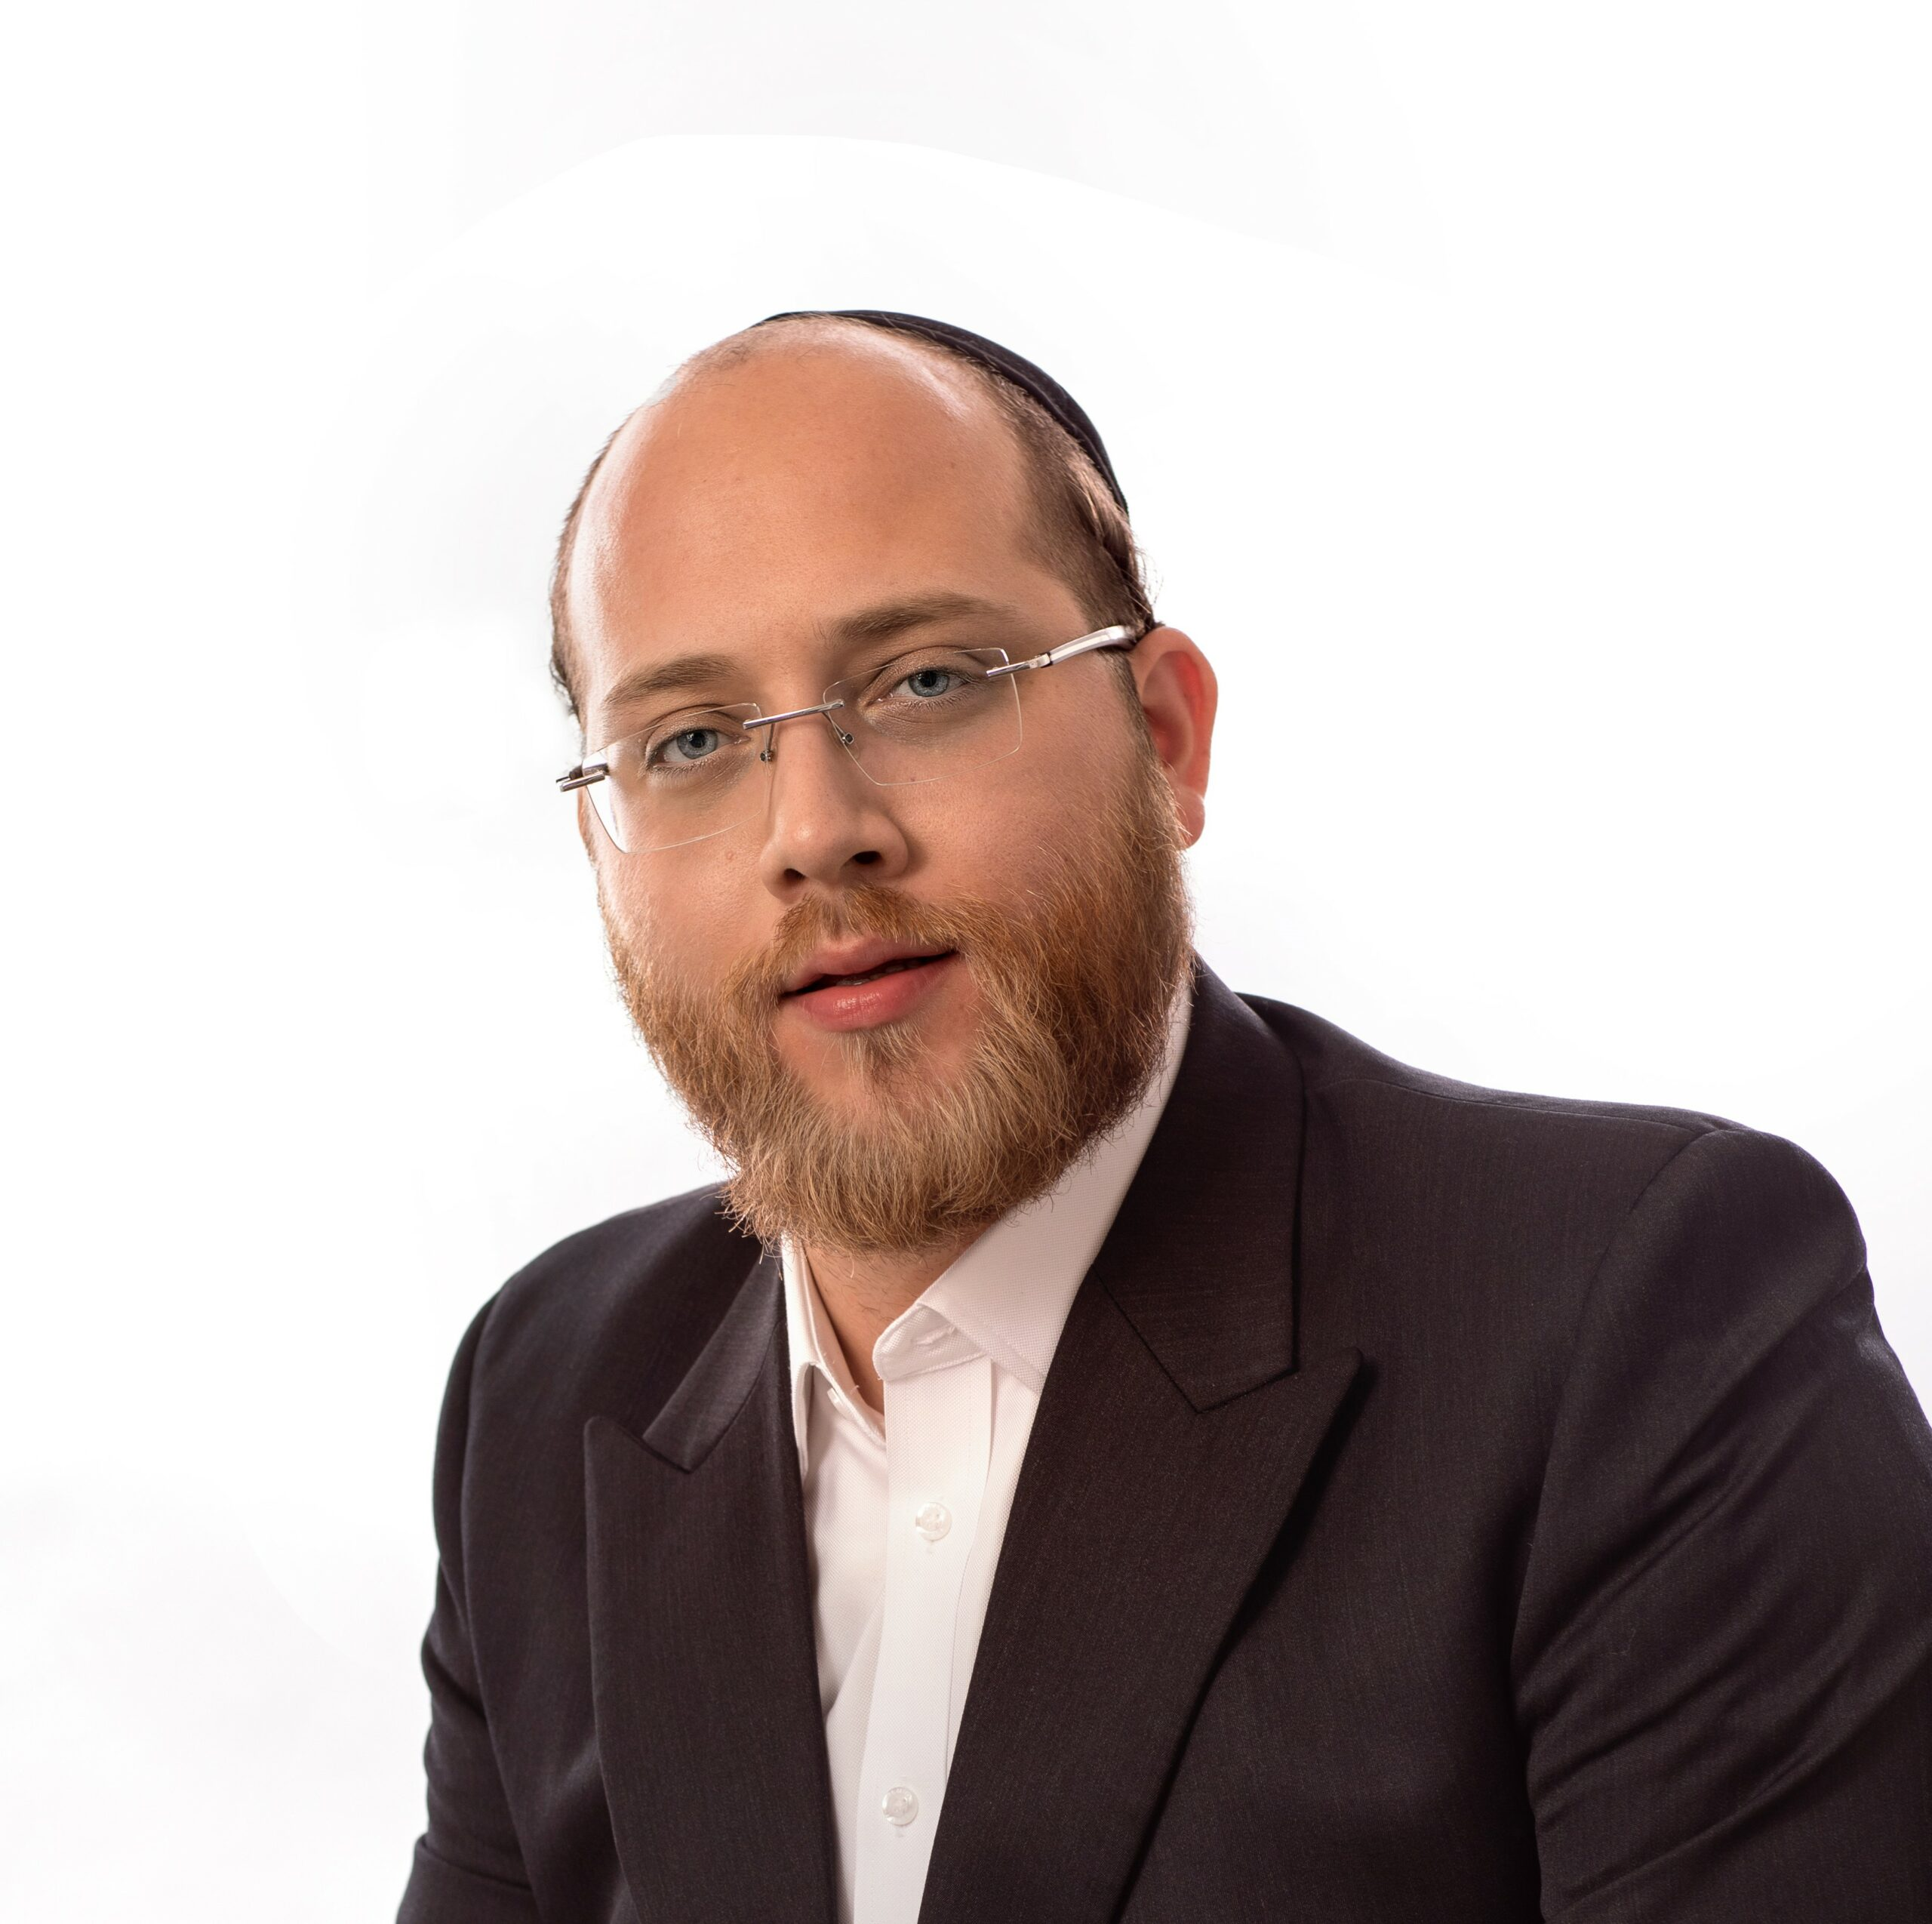 Eli Spitzer